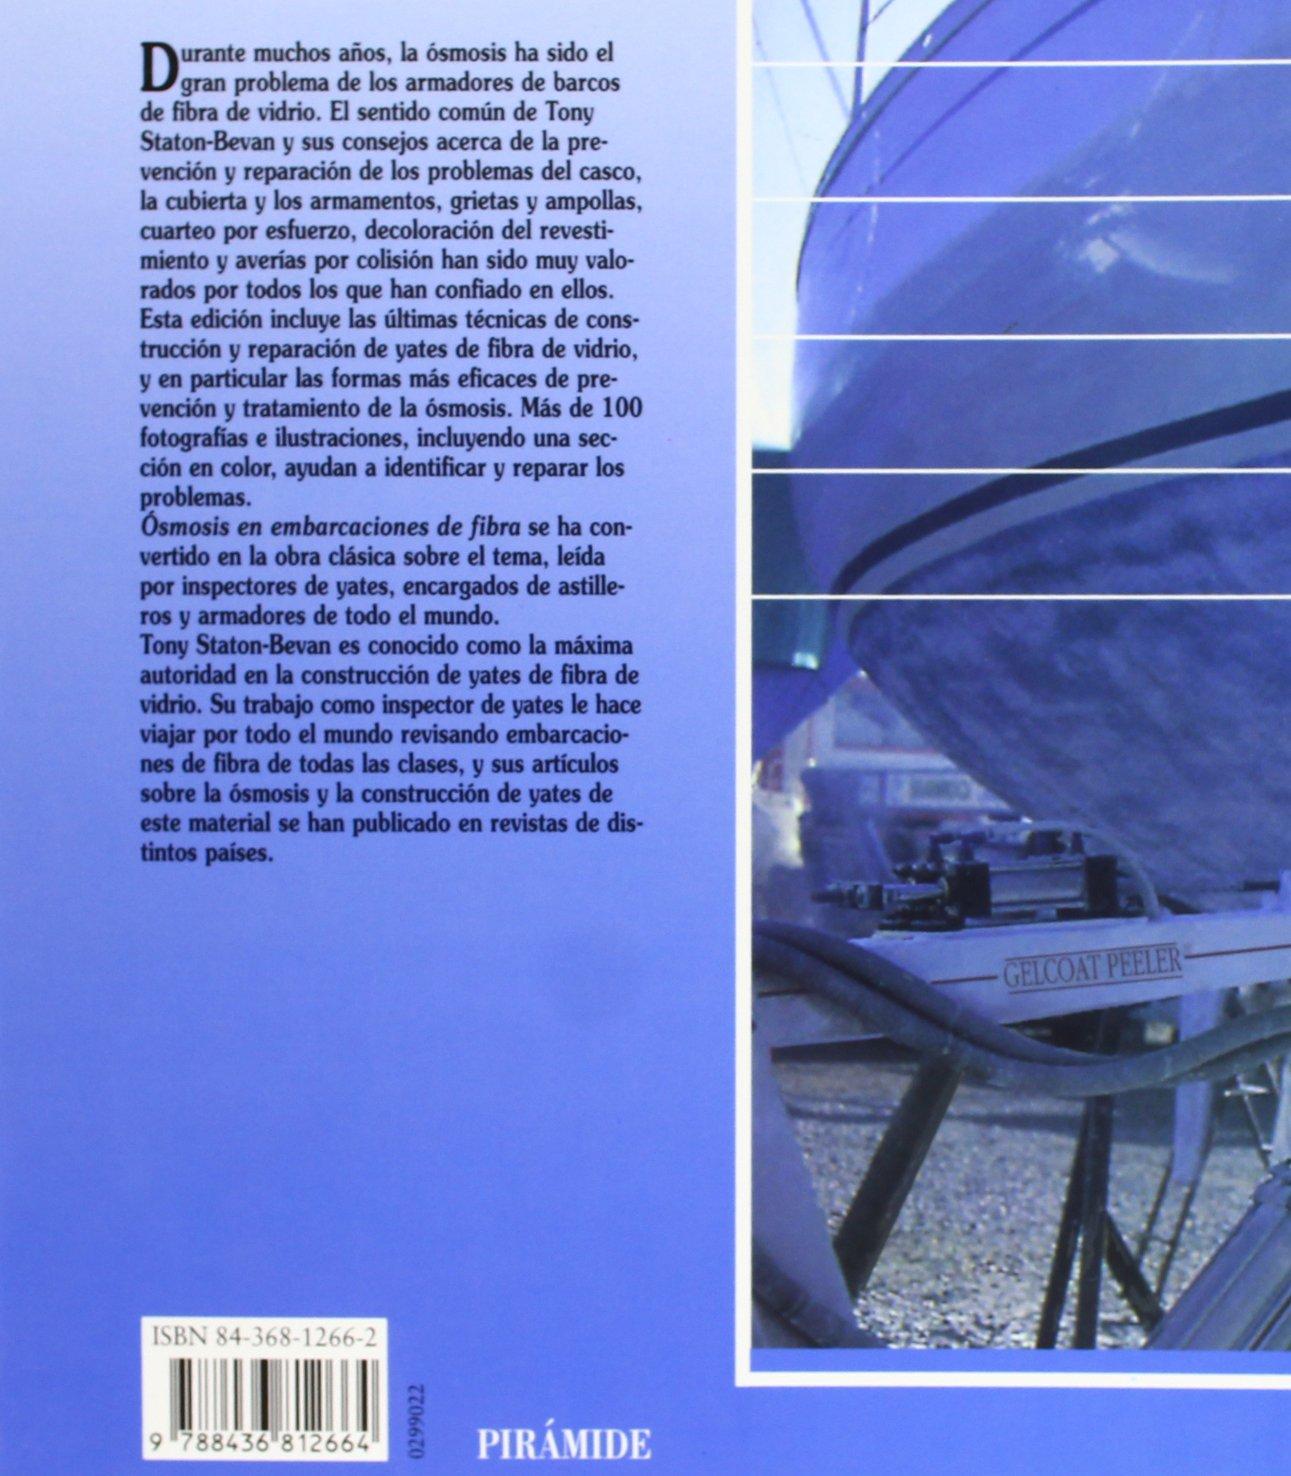 OSMOSIS EN ENBARCACIONES DE FIBRA náutica CONTRAPORTADA